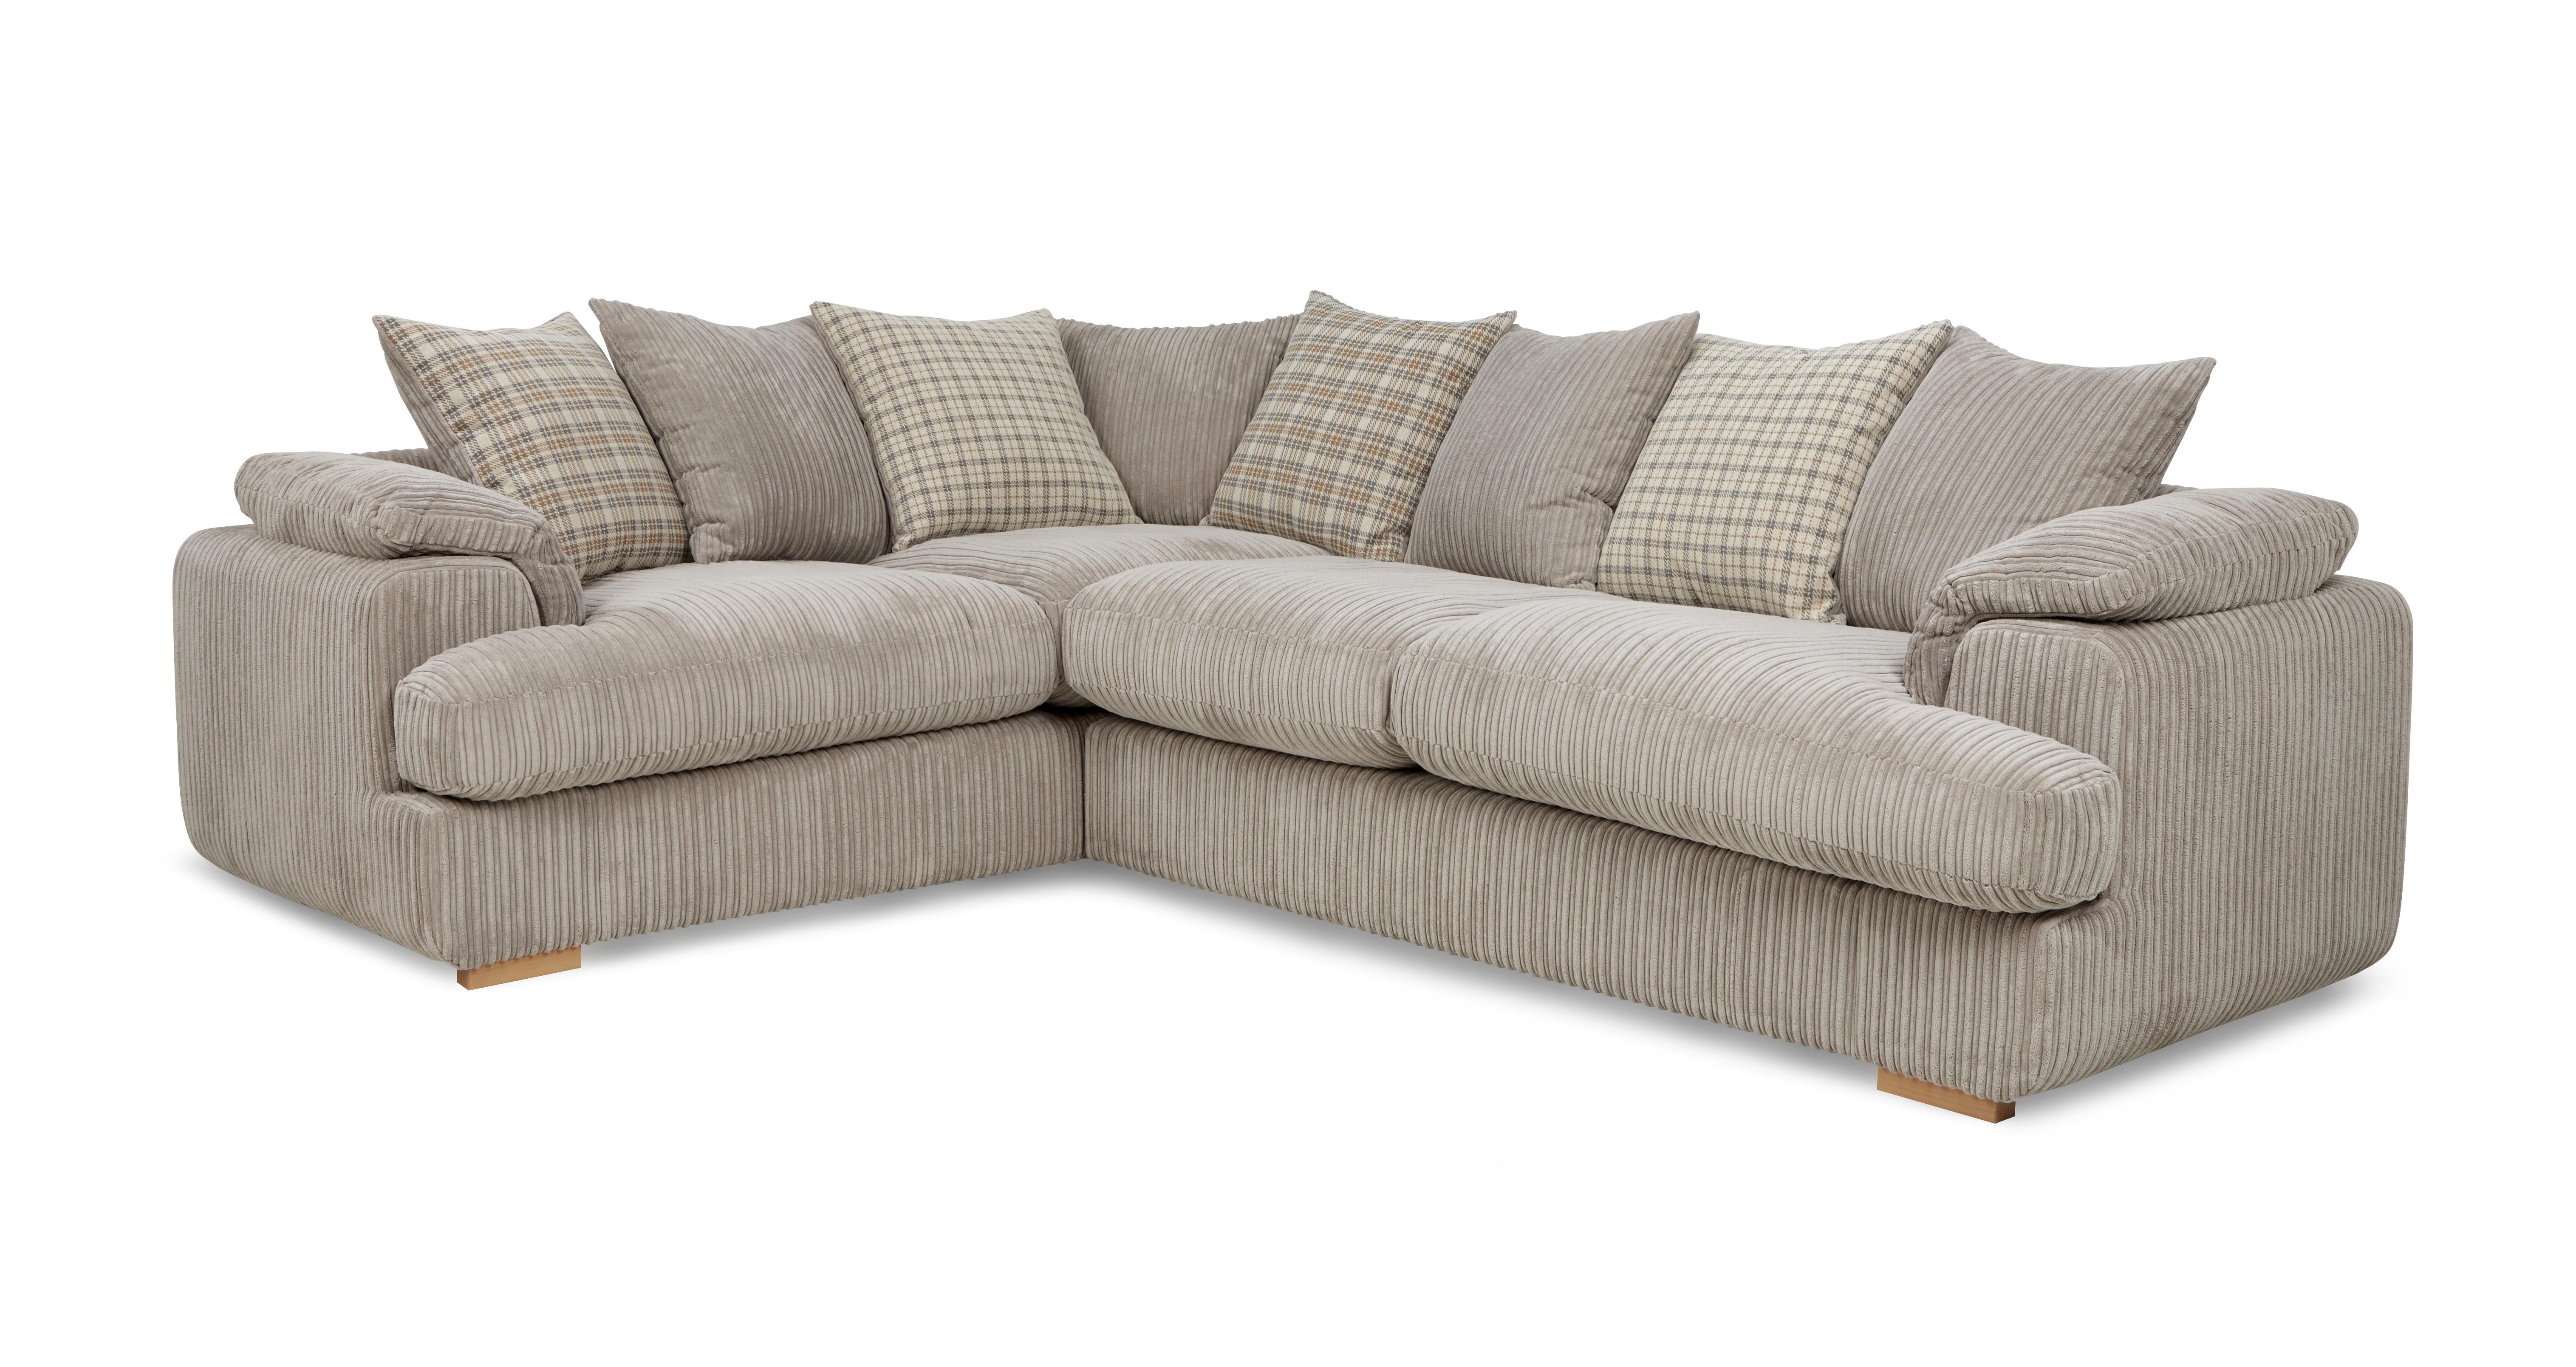 Celine: Right Arm Facing 2 Seater Pillow Back Corner Sofa